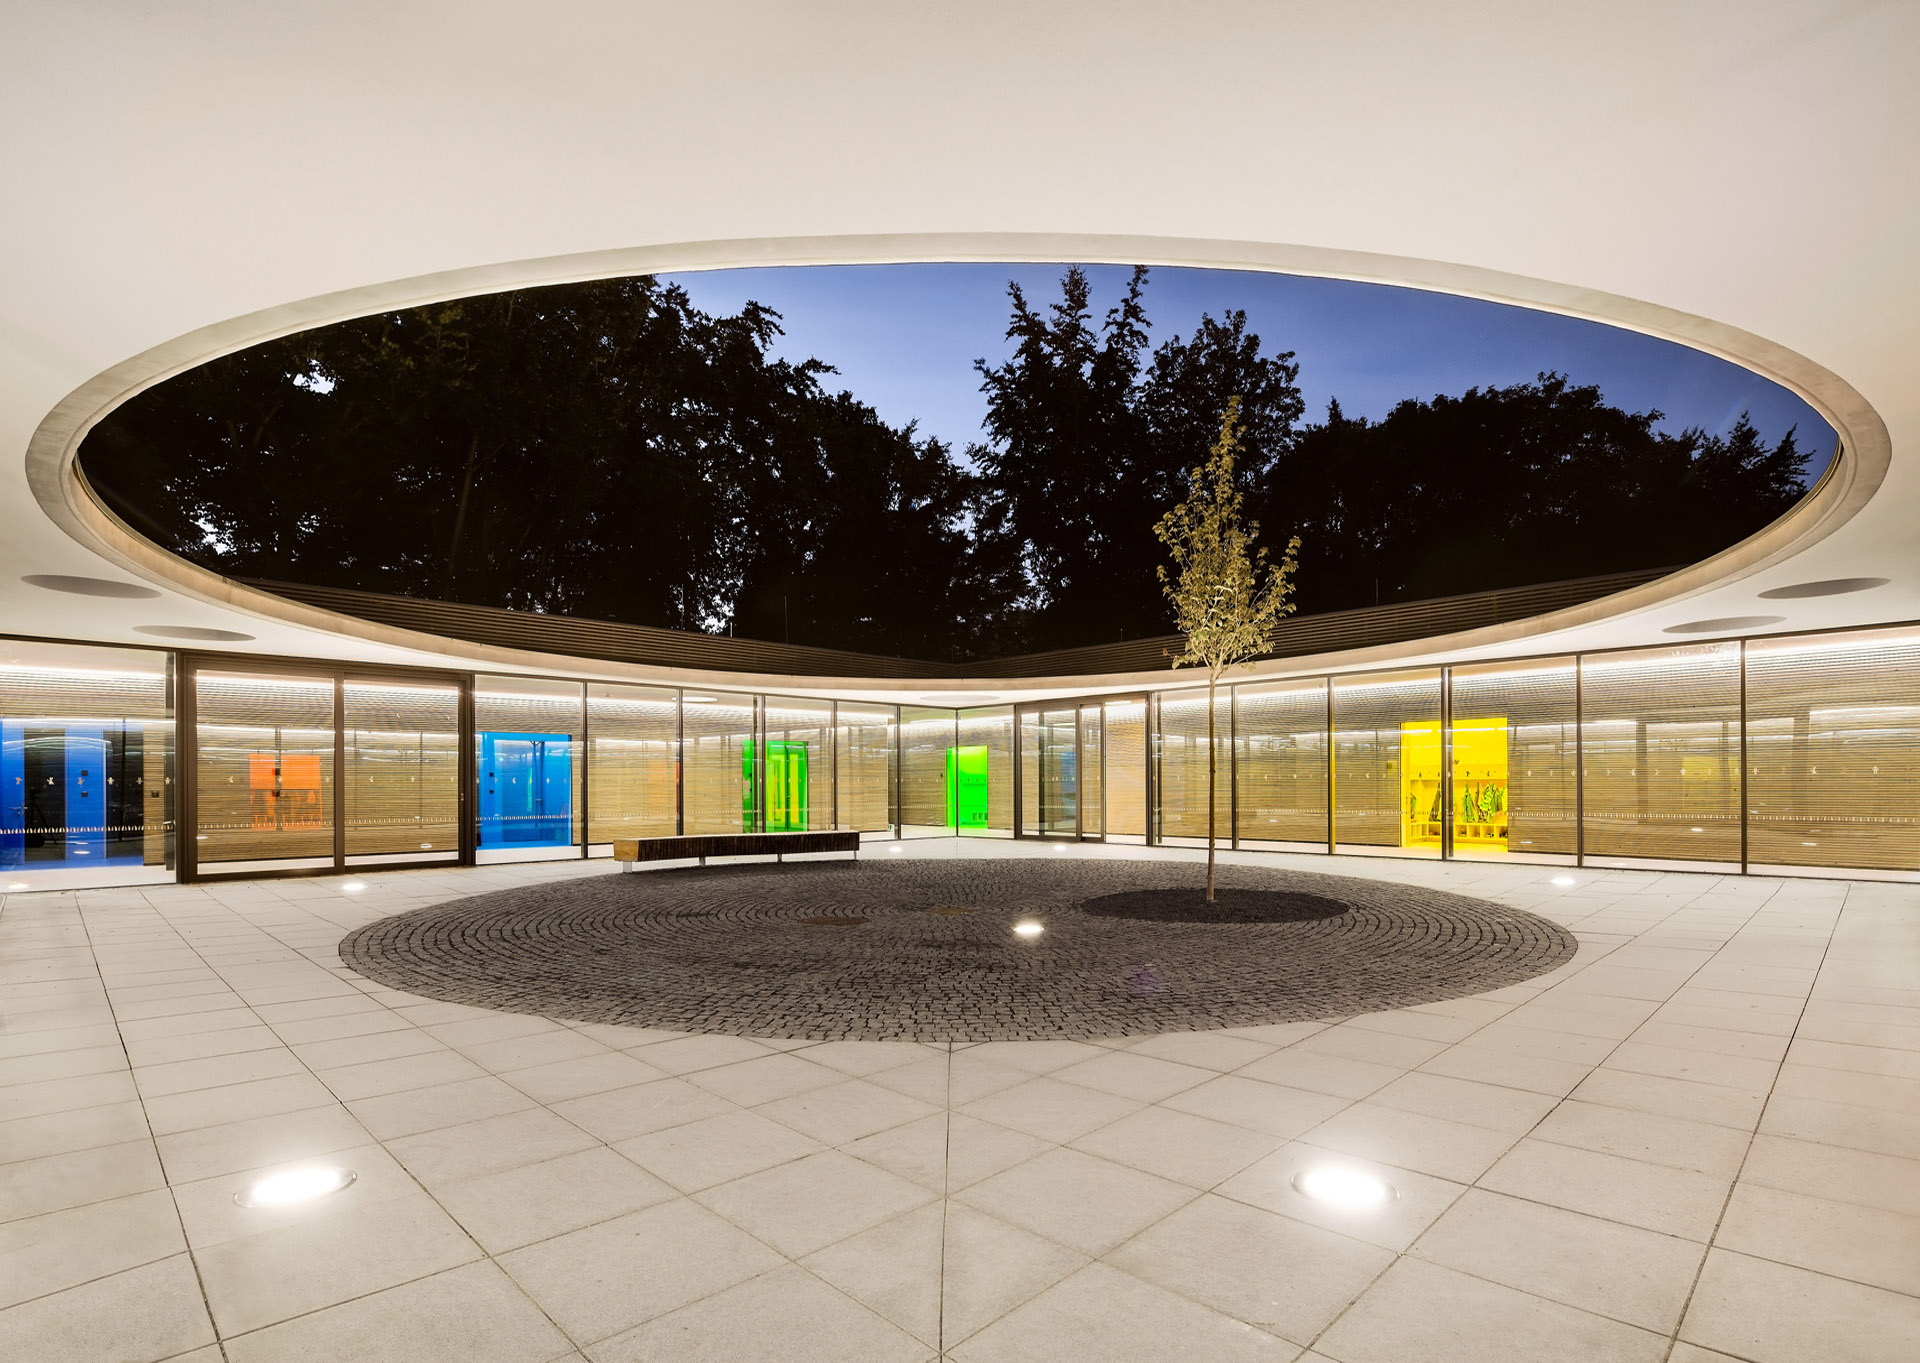 Fußbodenbelag Kita ~ Neubau kita pfarrzentrum st agnes in köln duda architekten